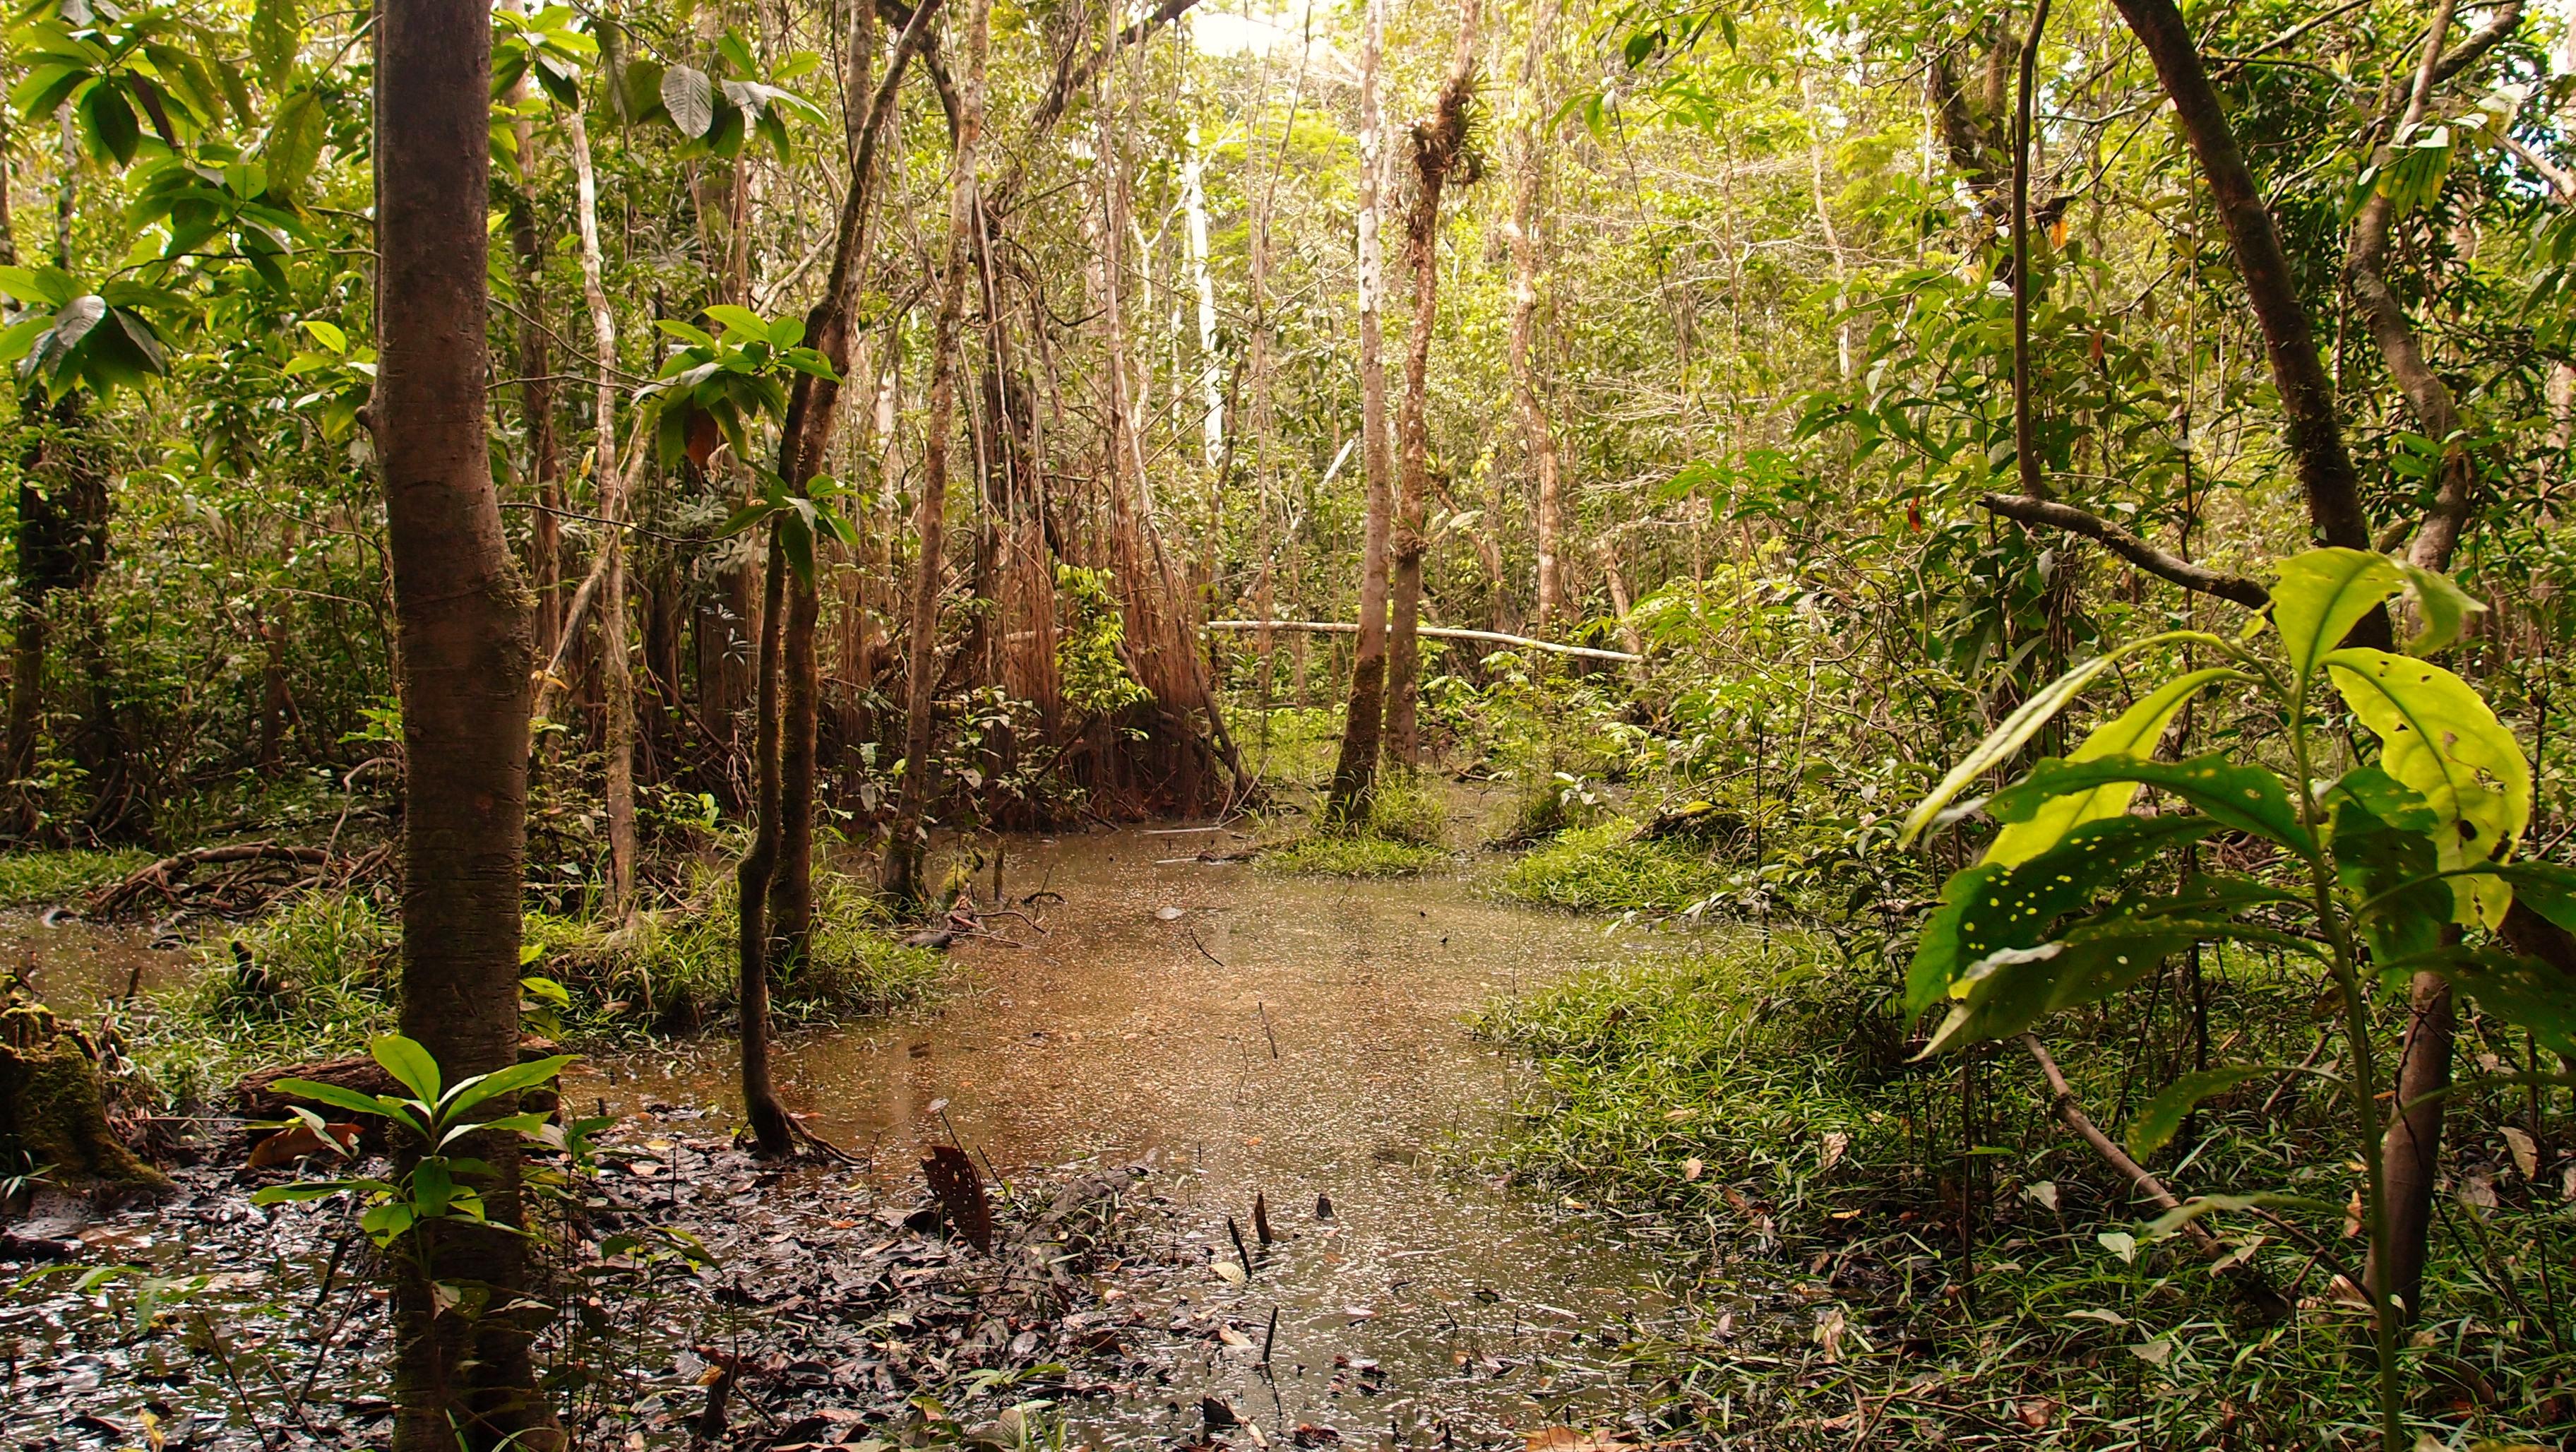 Amazonie, enclave primitive majestueuse